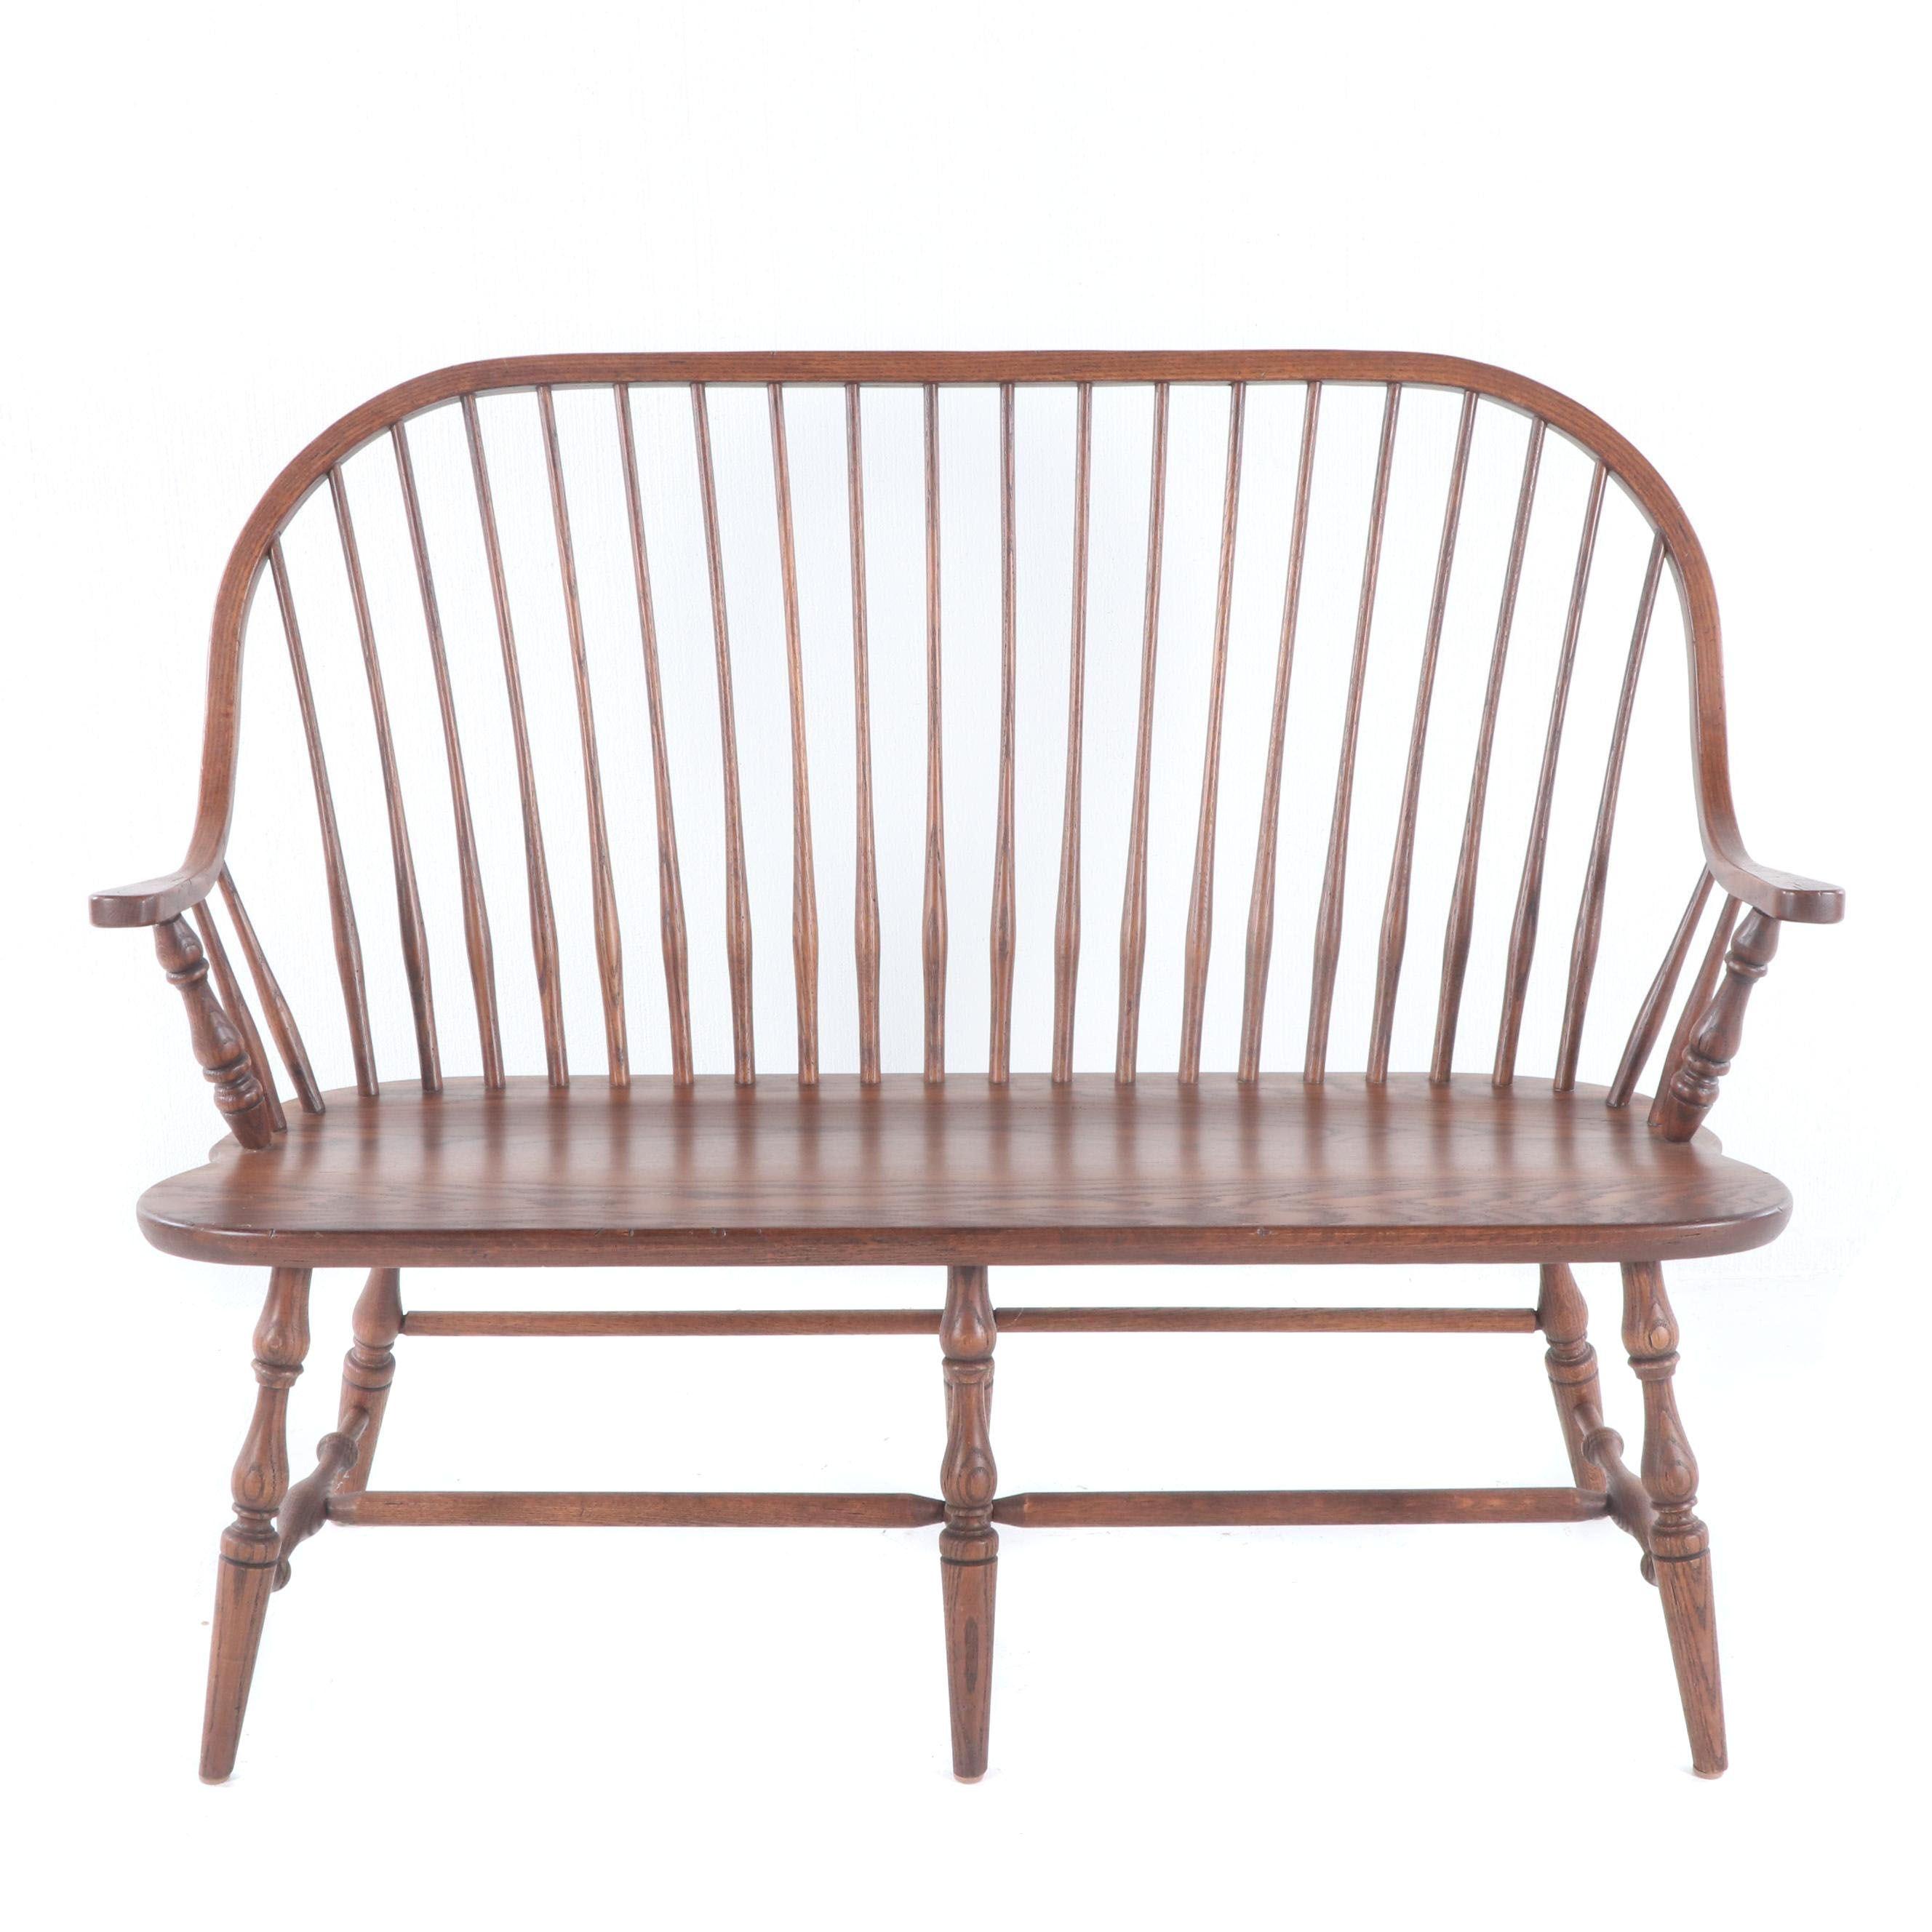 Windsor Style Oak Bench, Late 20th Century